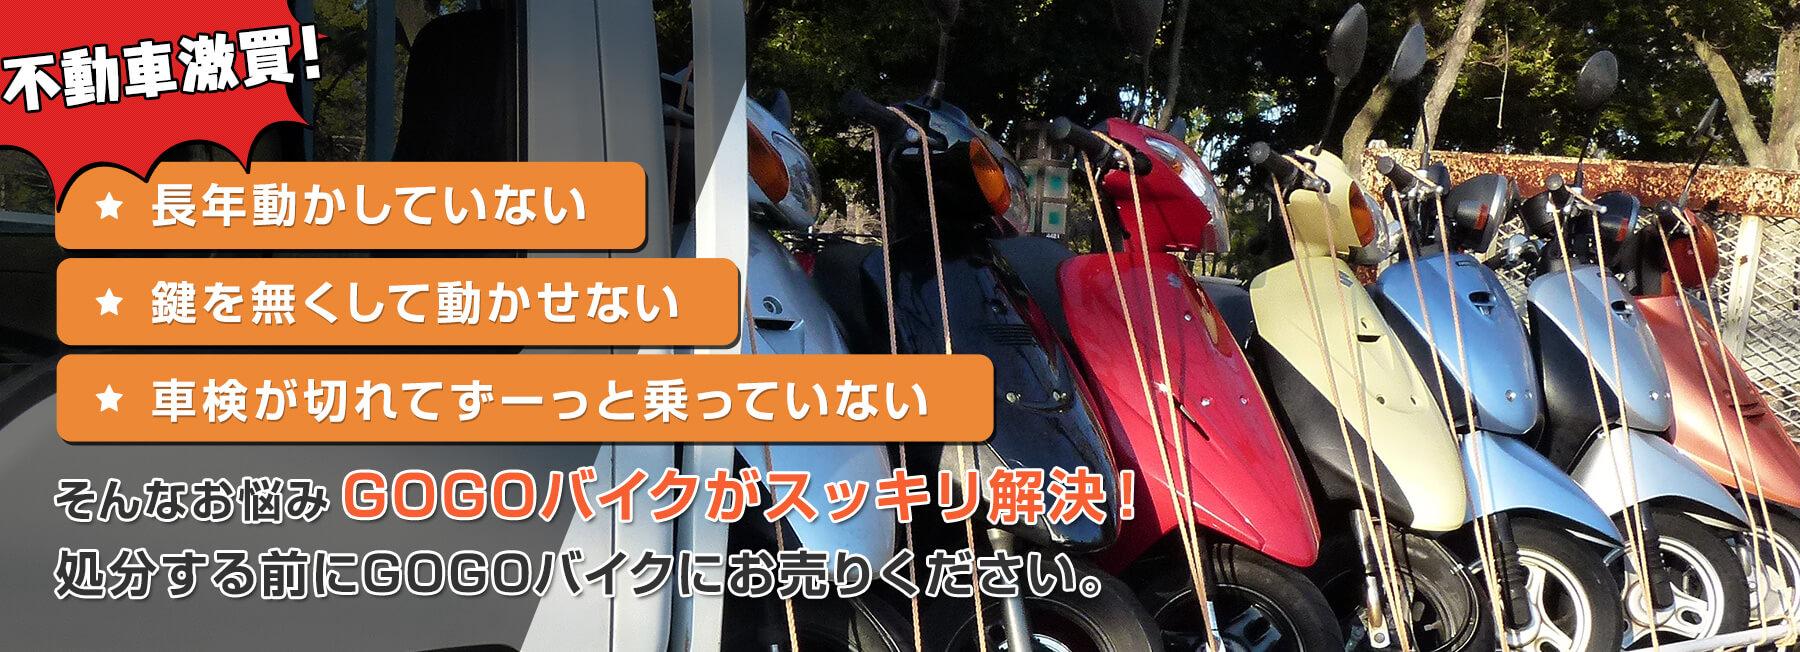 GOGOバイクがお悩みをスッキリ解決!